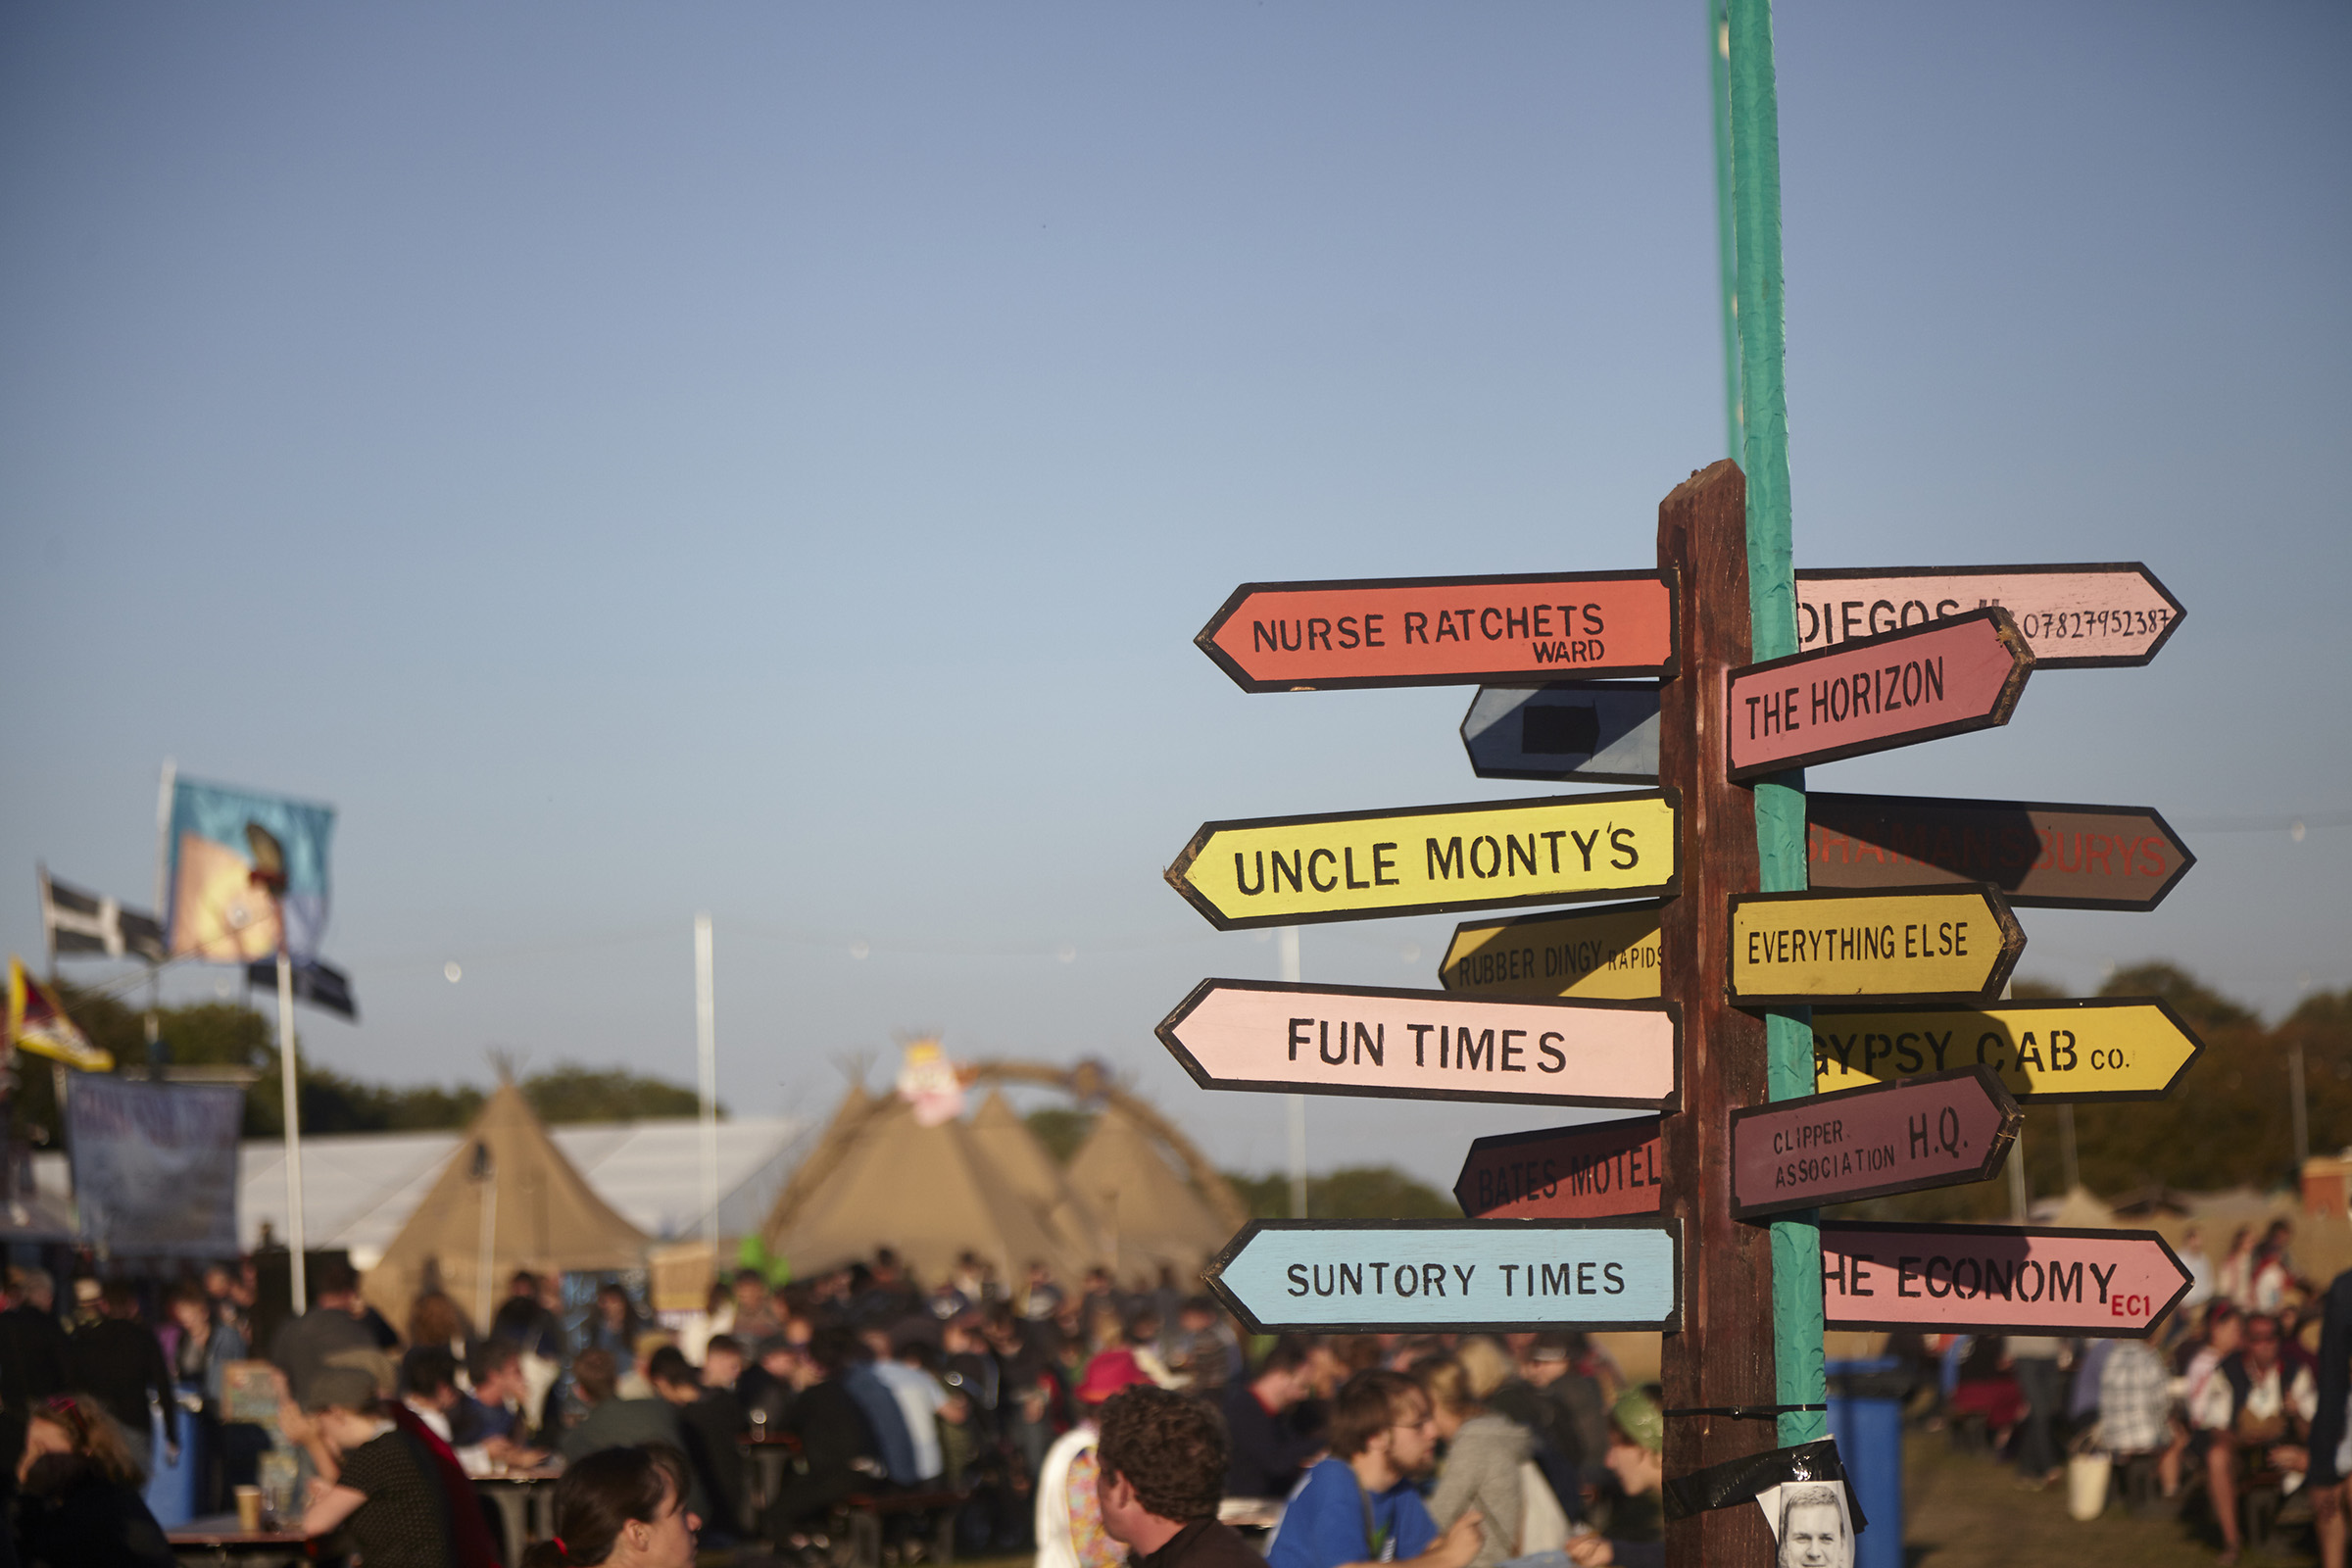 So which festival